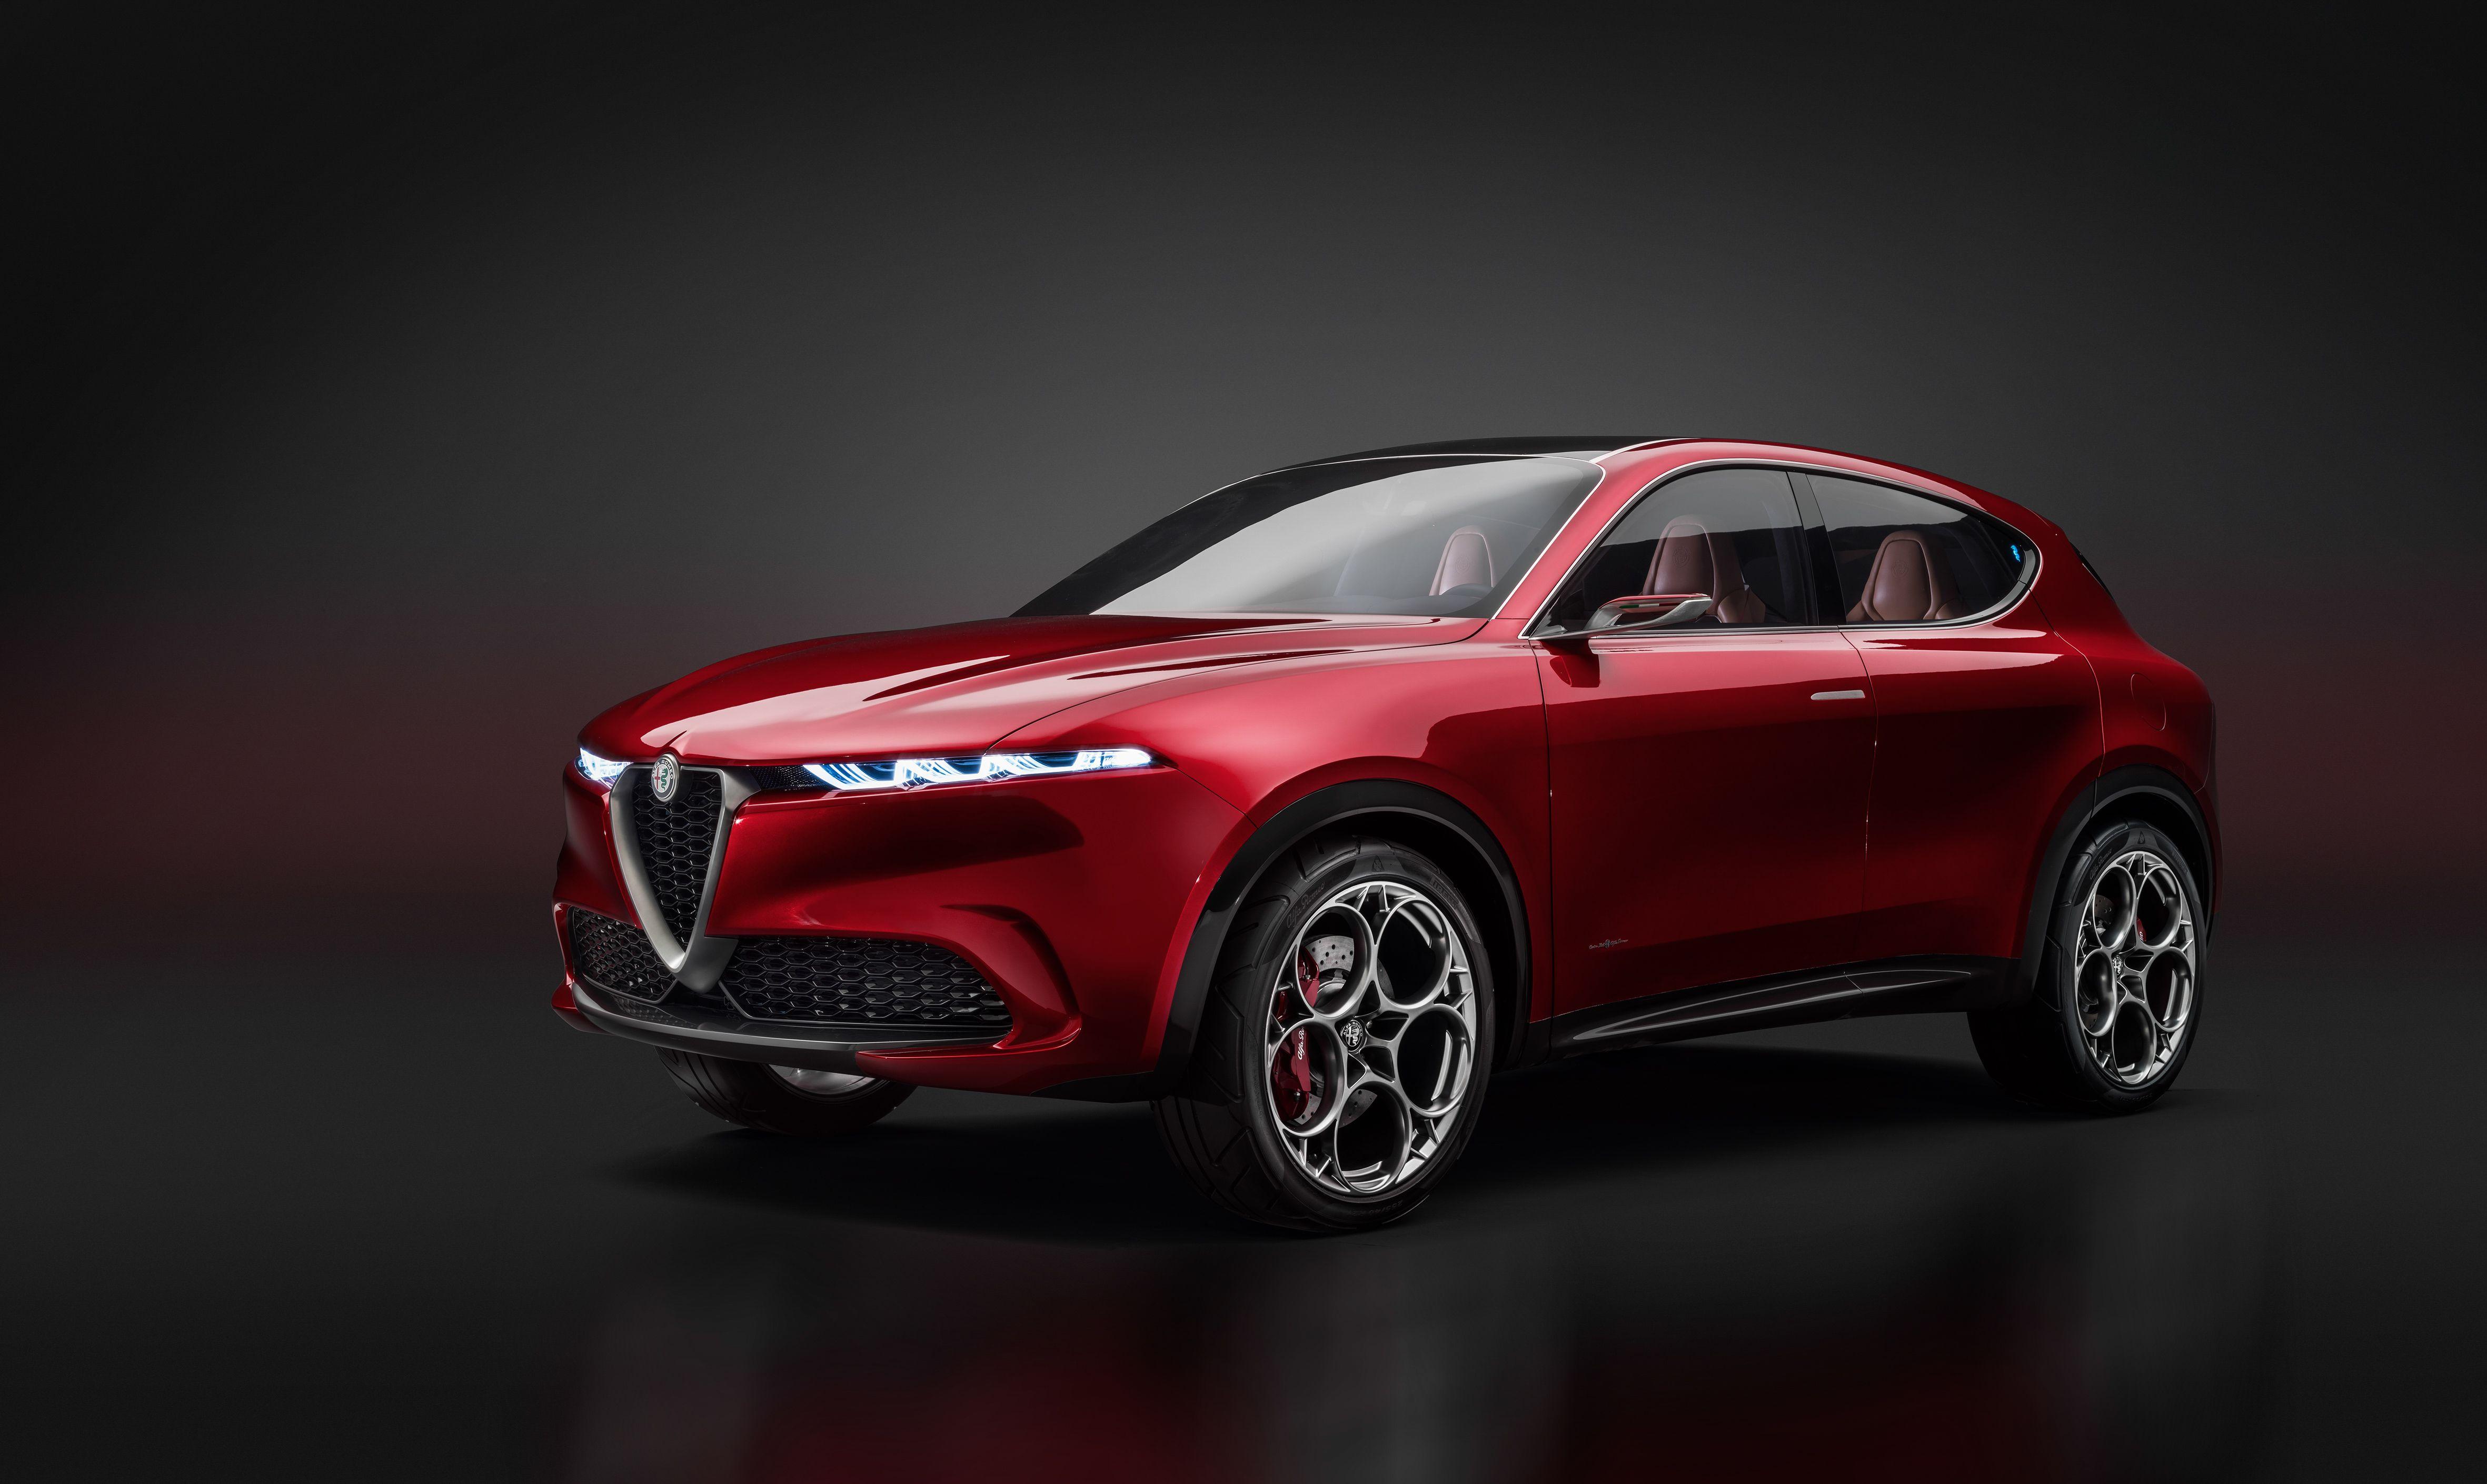 2021 Alfa Romeo Tonale What We Know So Far